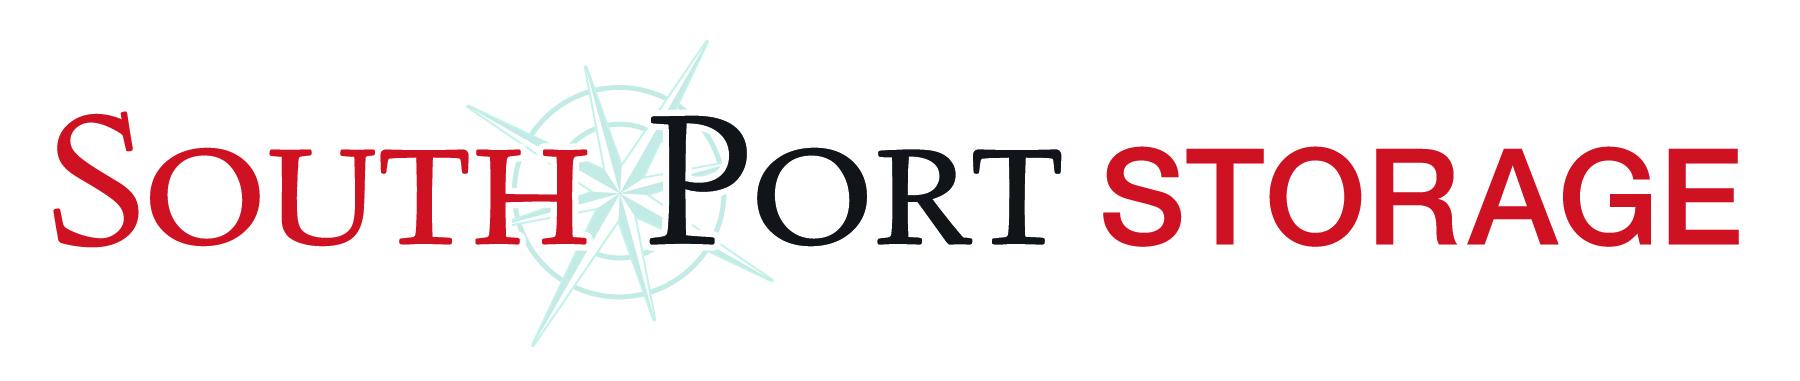 South Port Storage